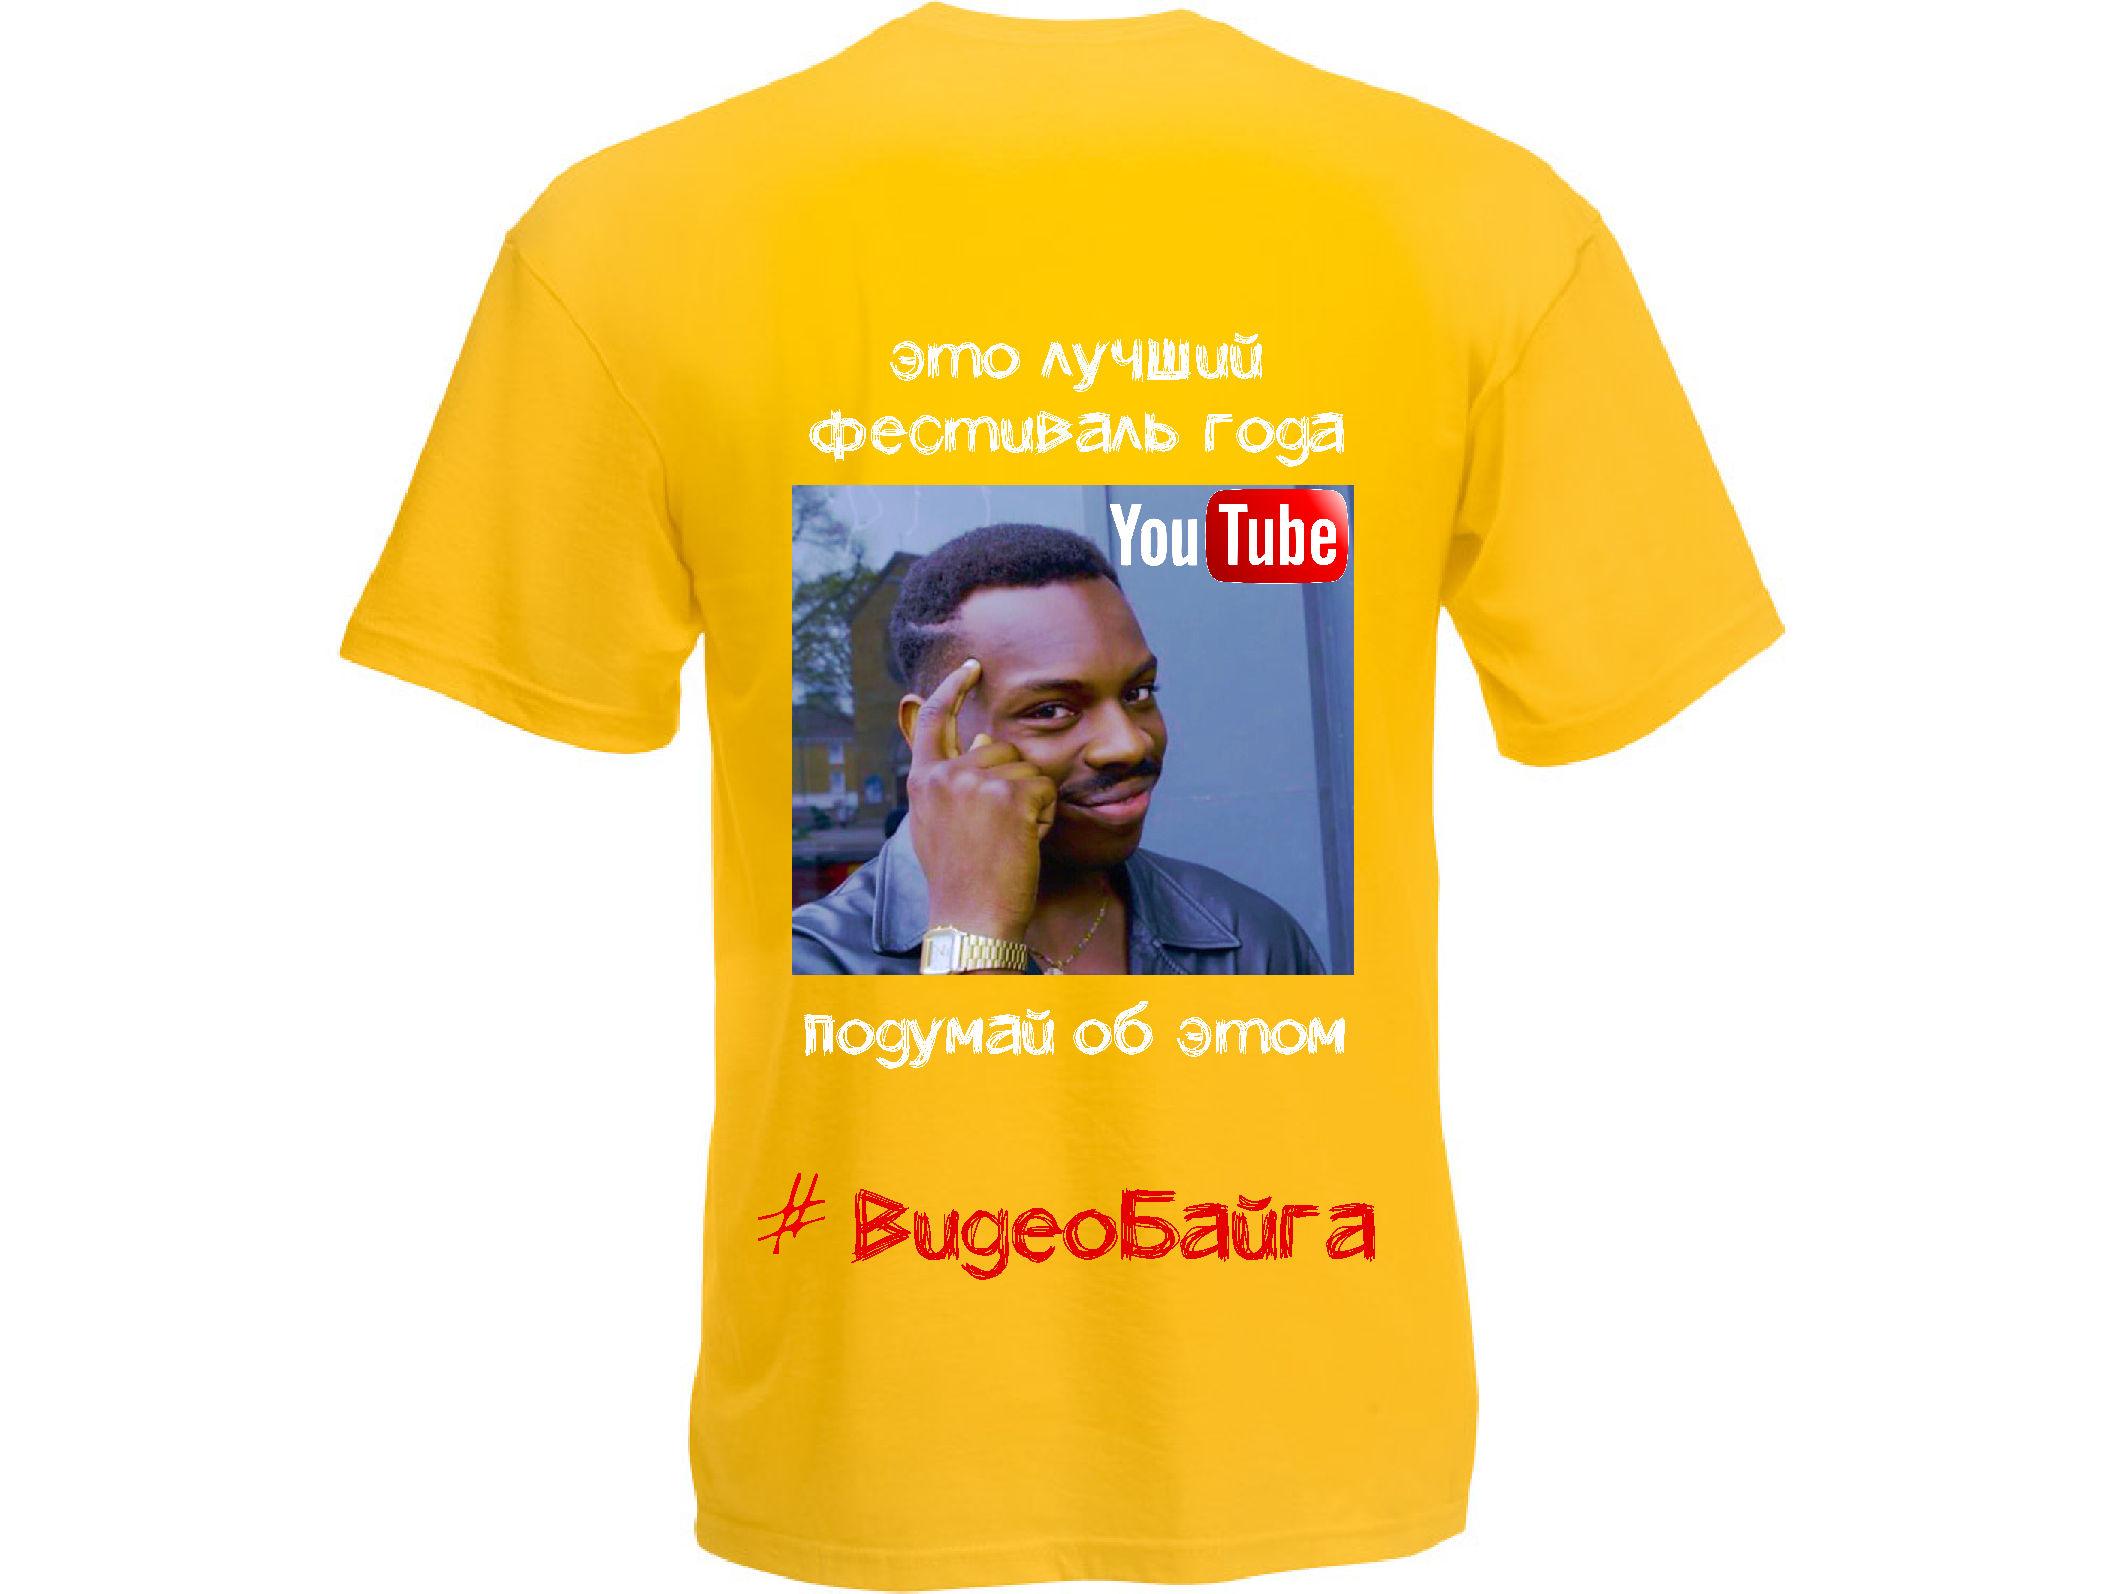 Дизайн принта на футболки для фестиваля YouTube блогеров  фото f_9595b490e4467939.jpg